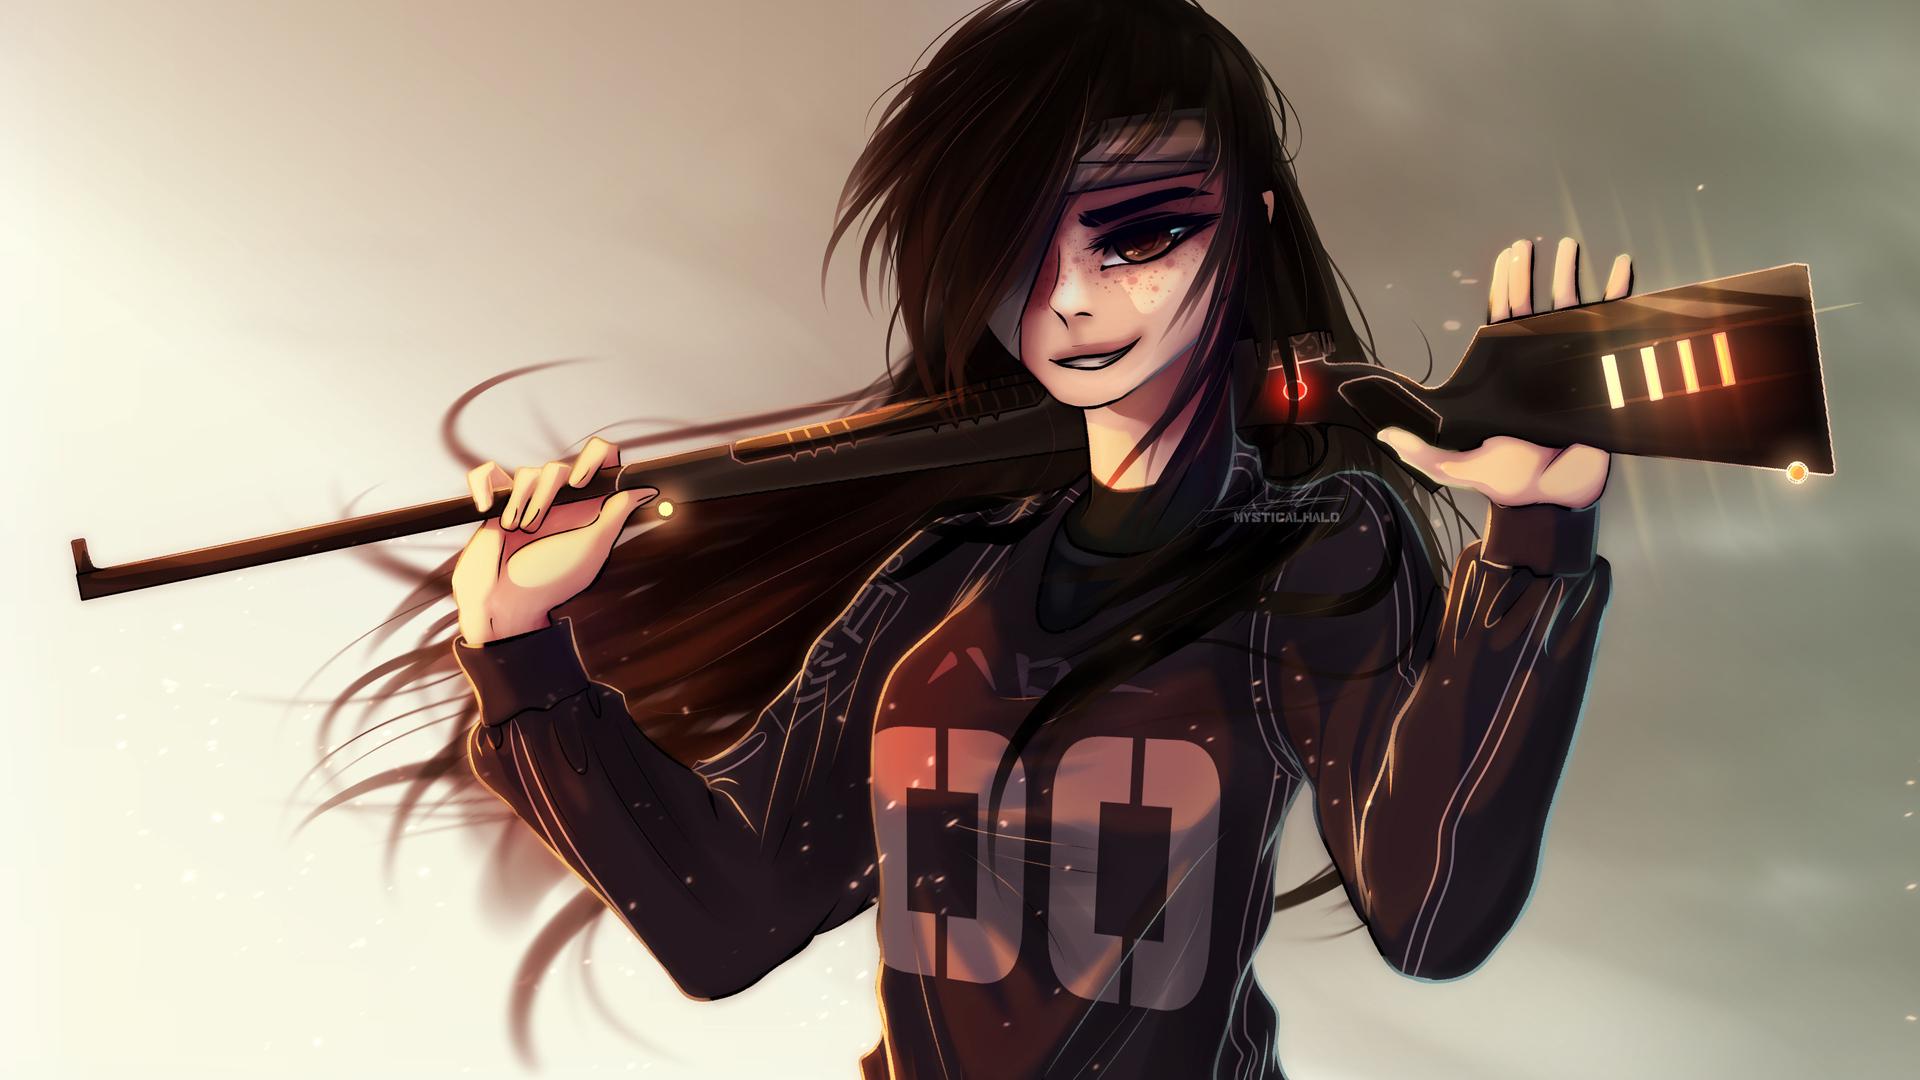 crazy-warrior-girl-with-gun-bs.jpg